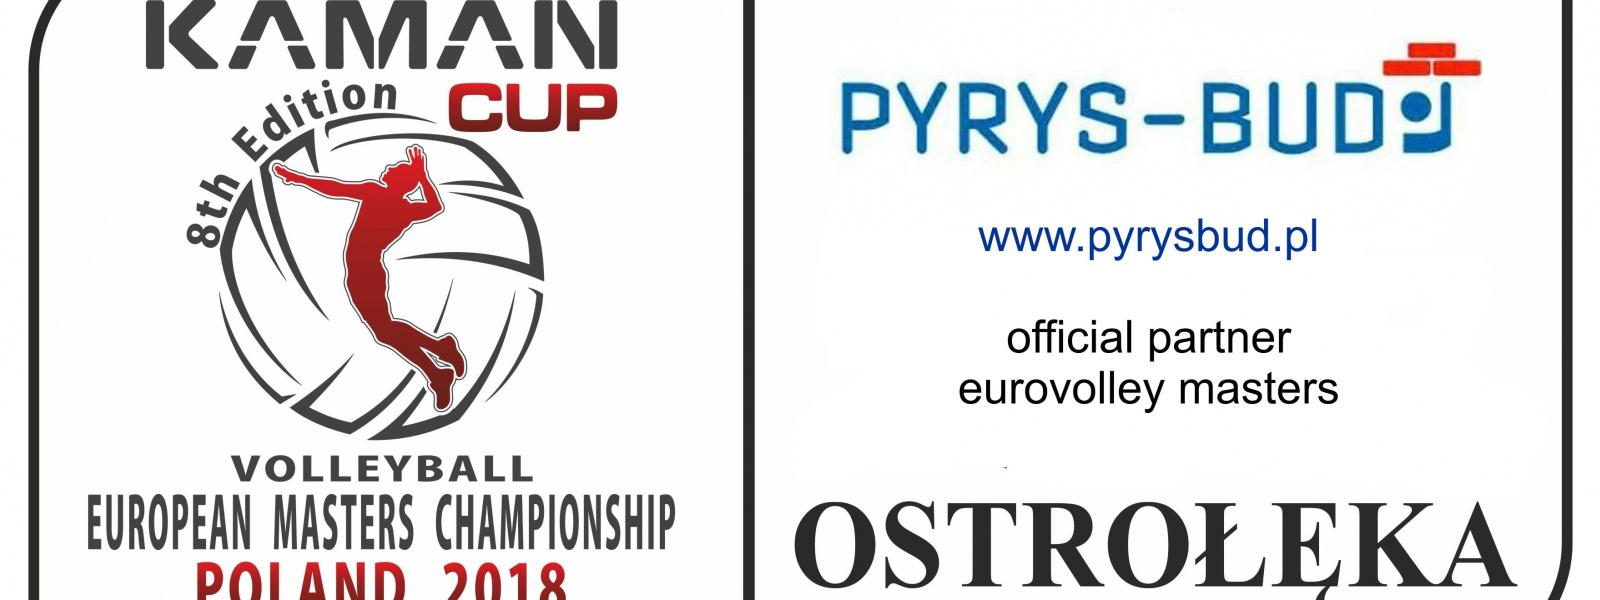 PLPS objął patronat nad Eurovolley Masters Ostrołęka 2018